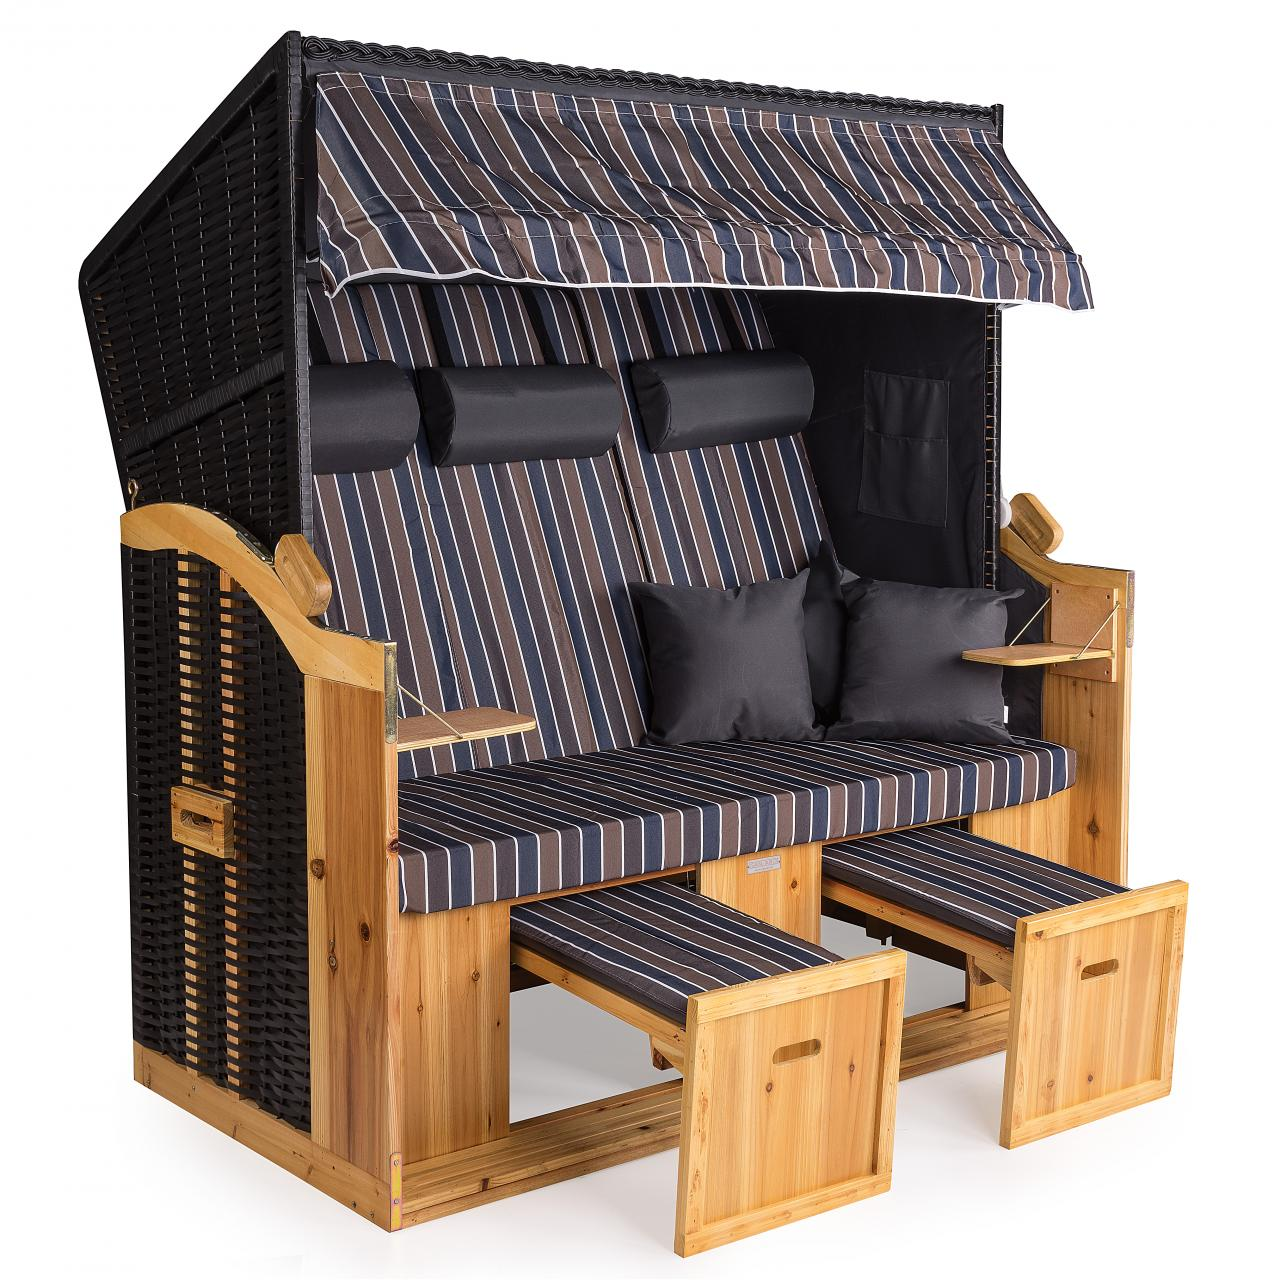 strandkorb xxl deluxe 160cm volllieger gartenliege ostsee. Black Bedroom Furniture Sets. Home Design Ideas